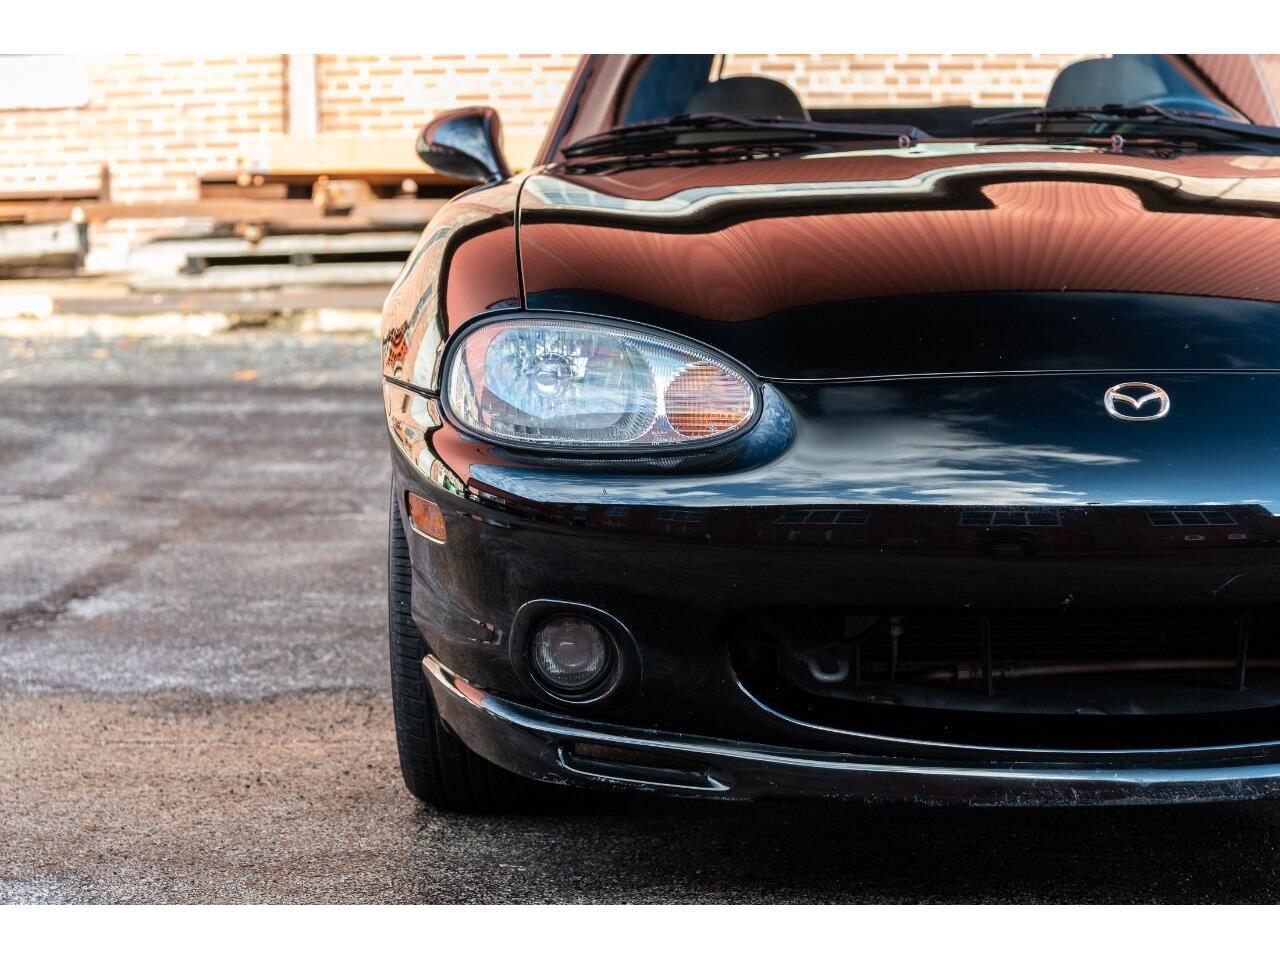 1999 Mazda Miata (CC-1364830) for sale in Saint Charles, Missouri